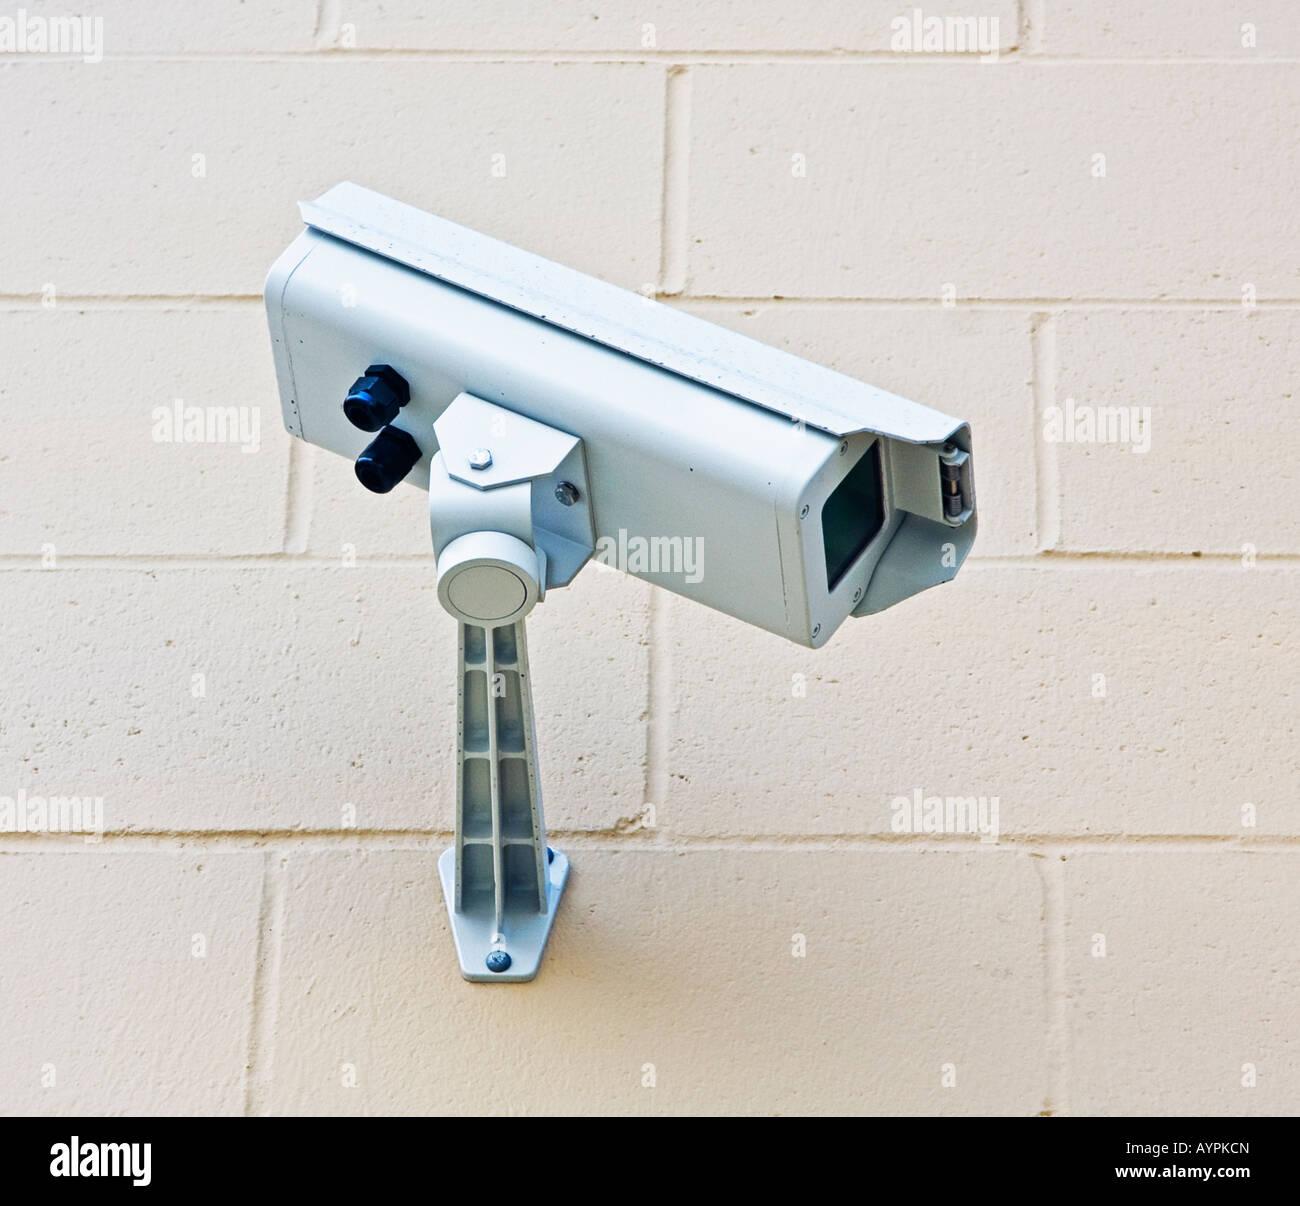 video surveillance camera - Stock Image